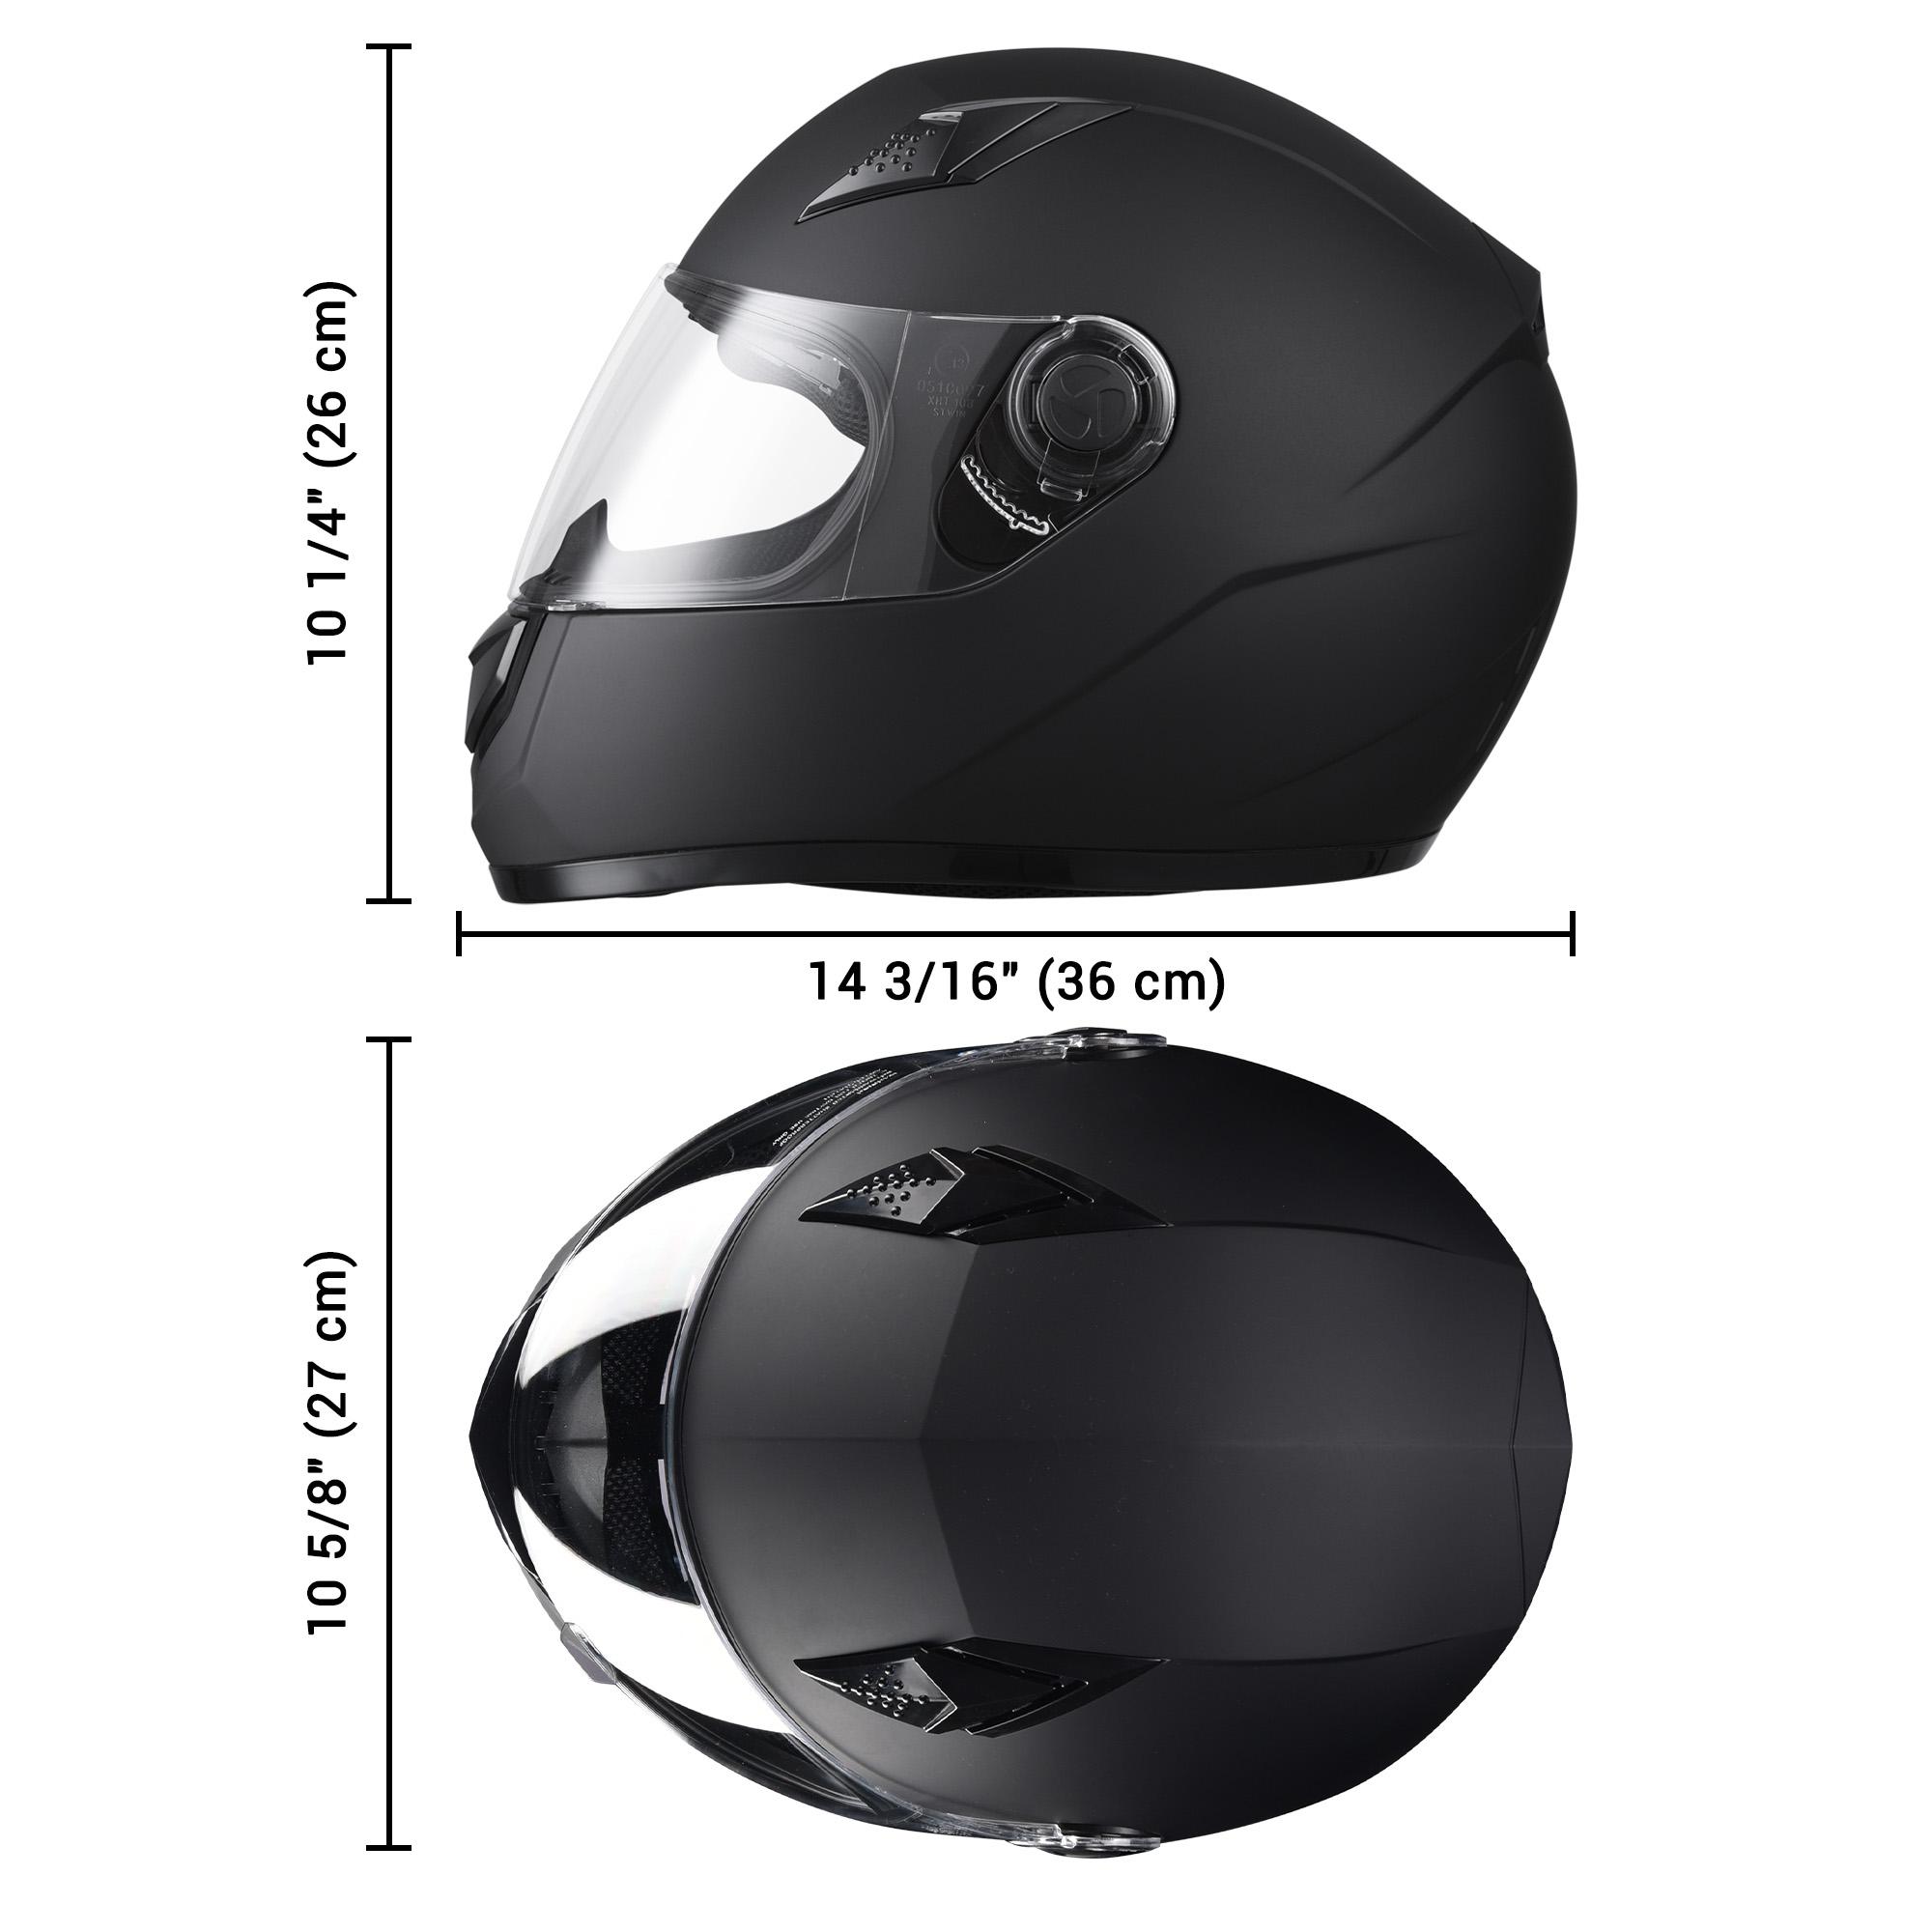 miniature 106 - AHR K12 Full Face Motorcycle Helmet DOT Air Vents Clear Visor Racing S M L XL